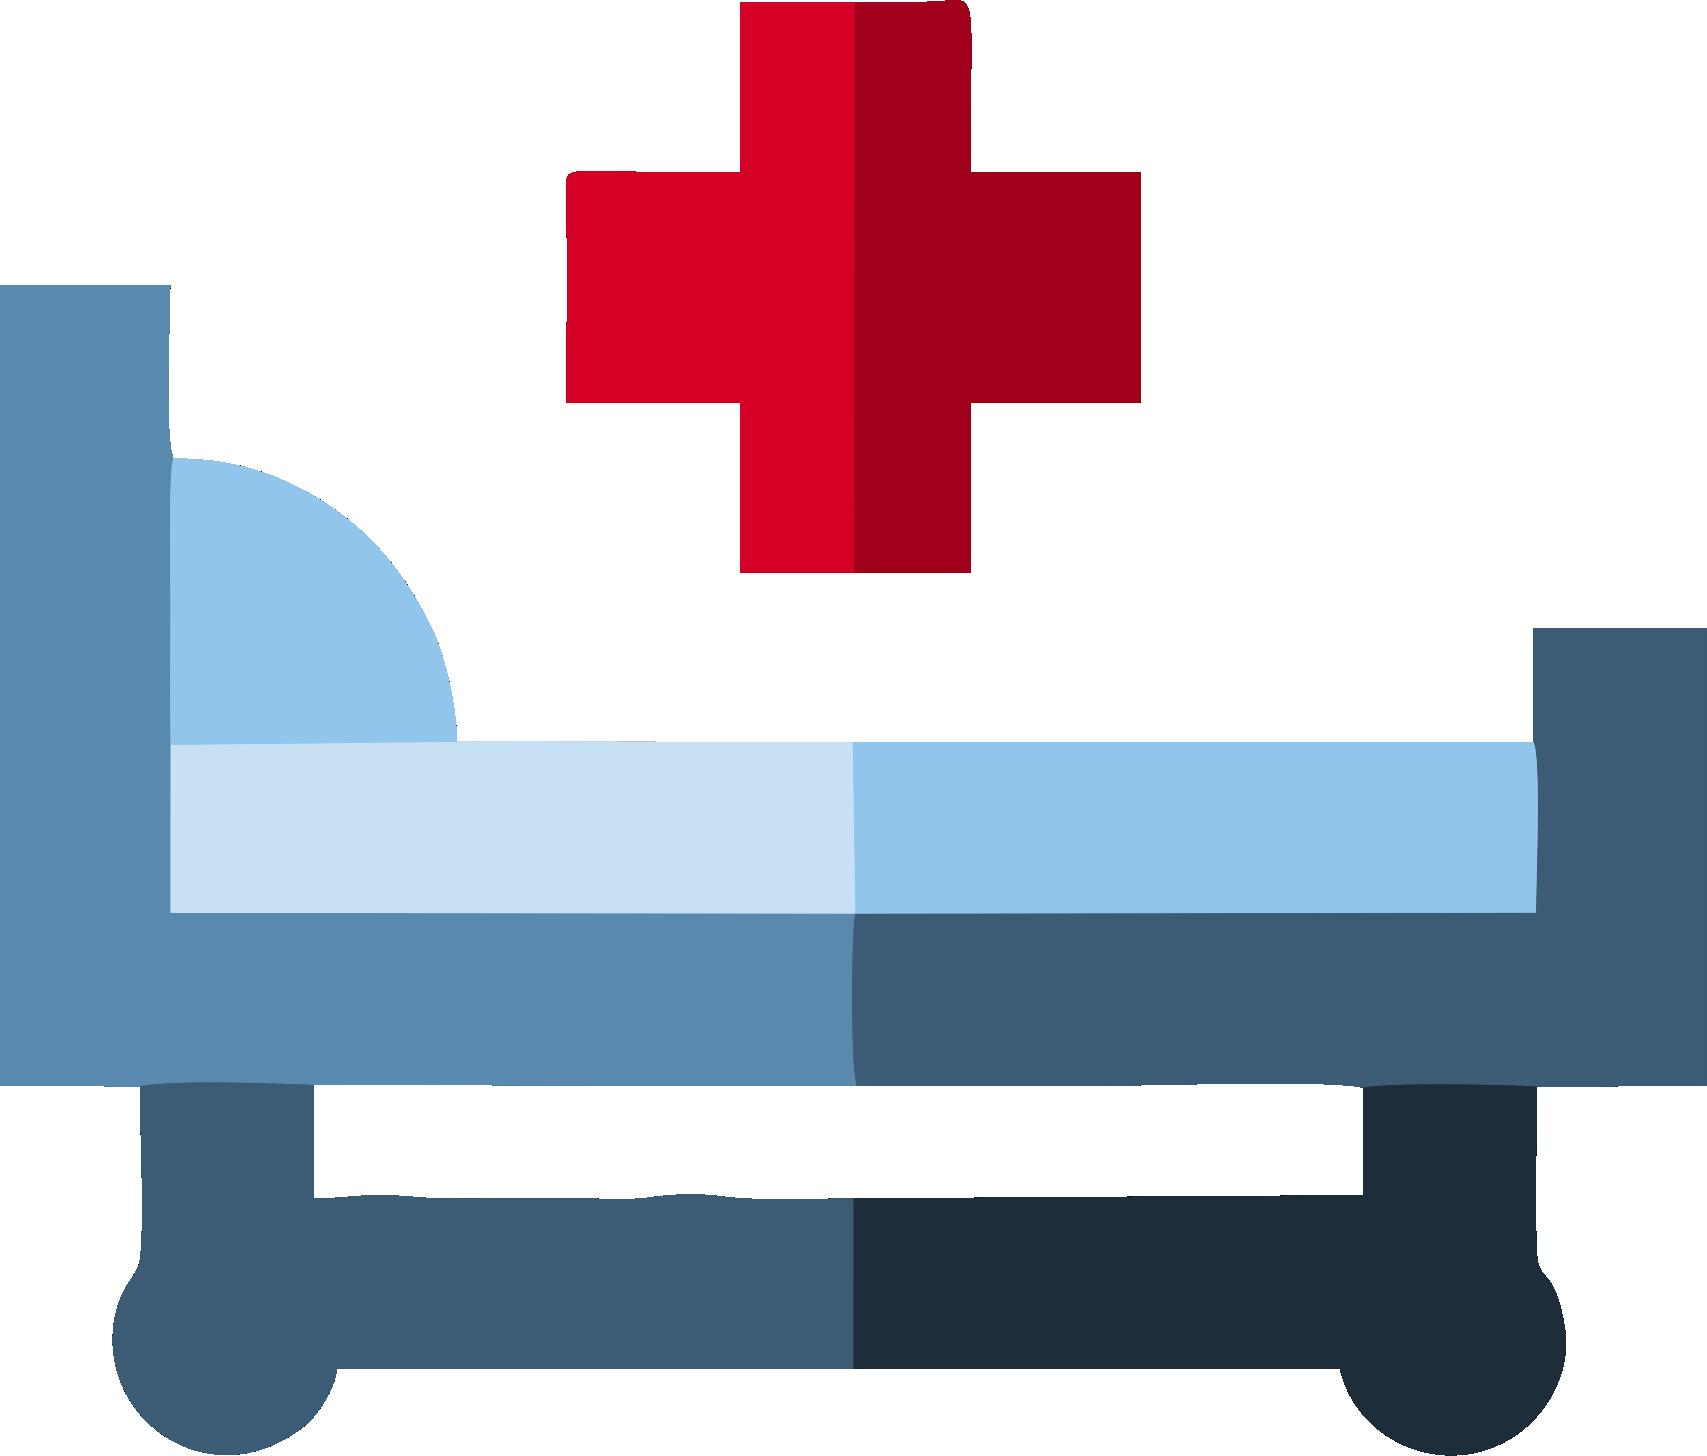 Emergency clipart hospital emergency. Oakbend med center no